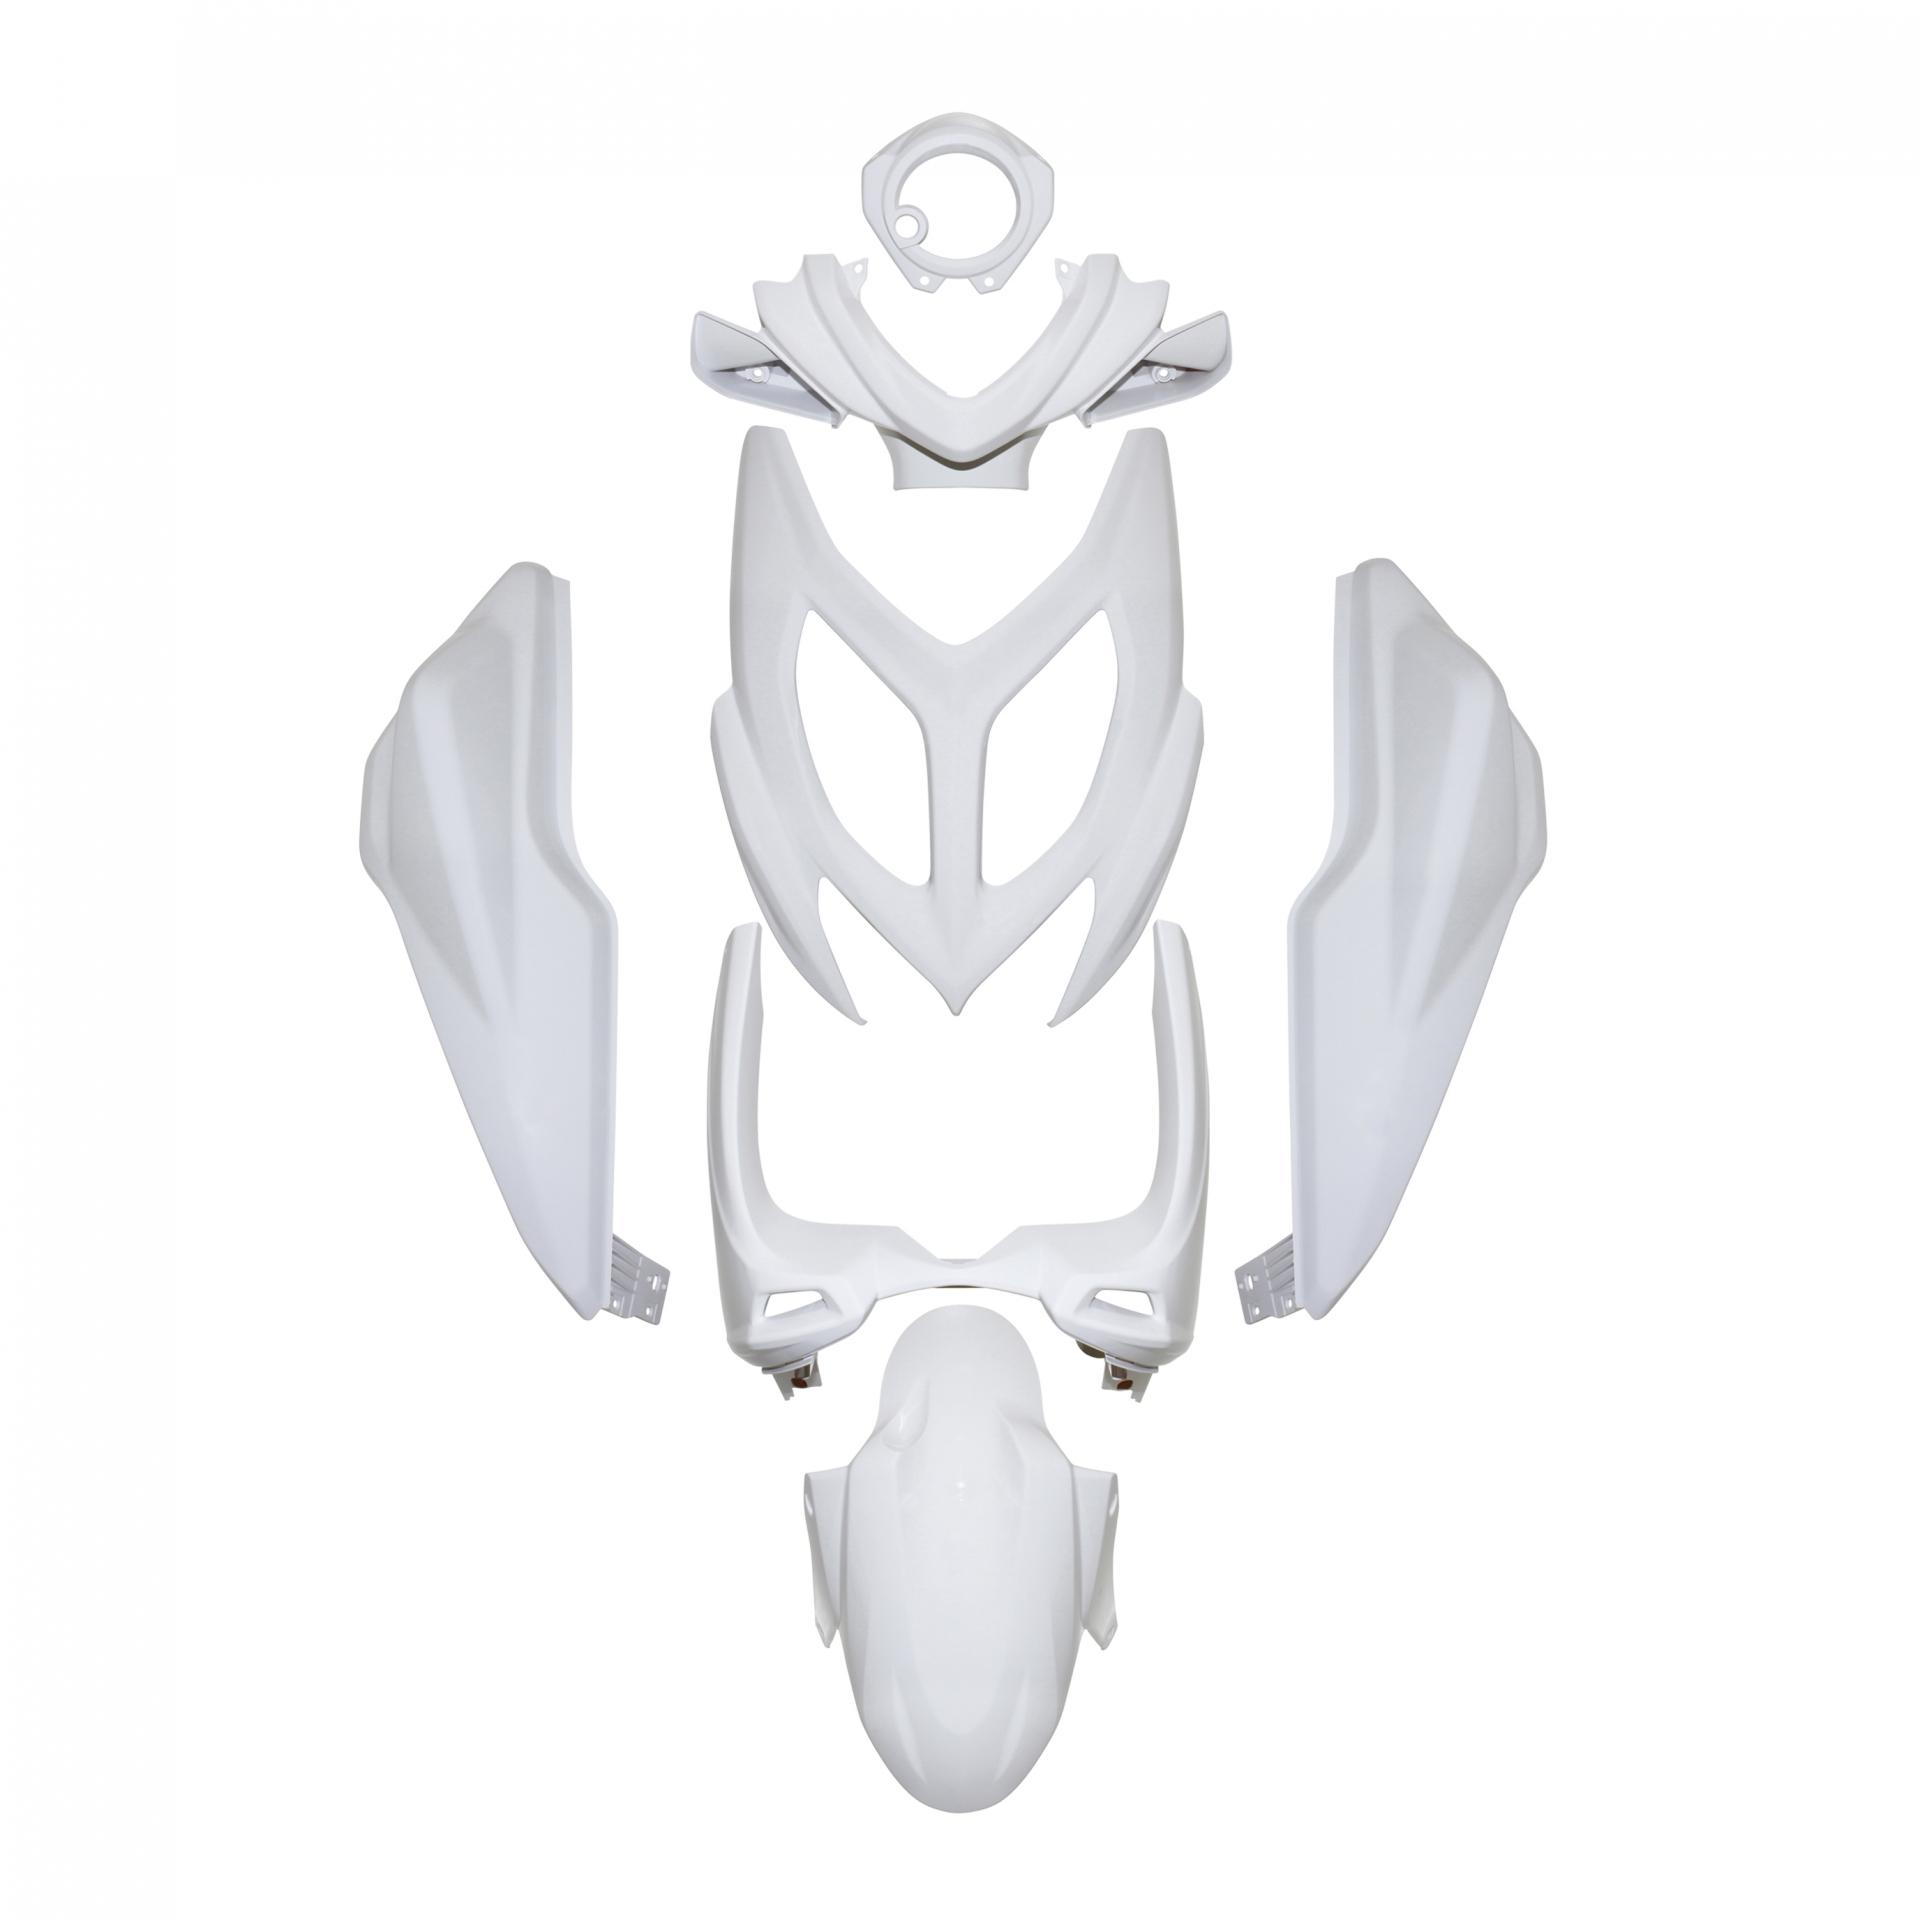 Kit carénage 1Tek Origine blanc brillant Nitro/Aerox 2013-